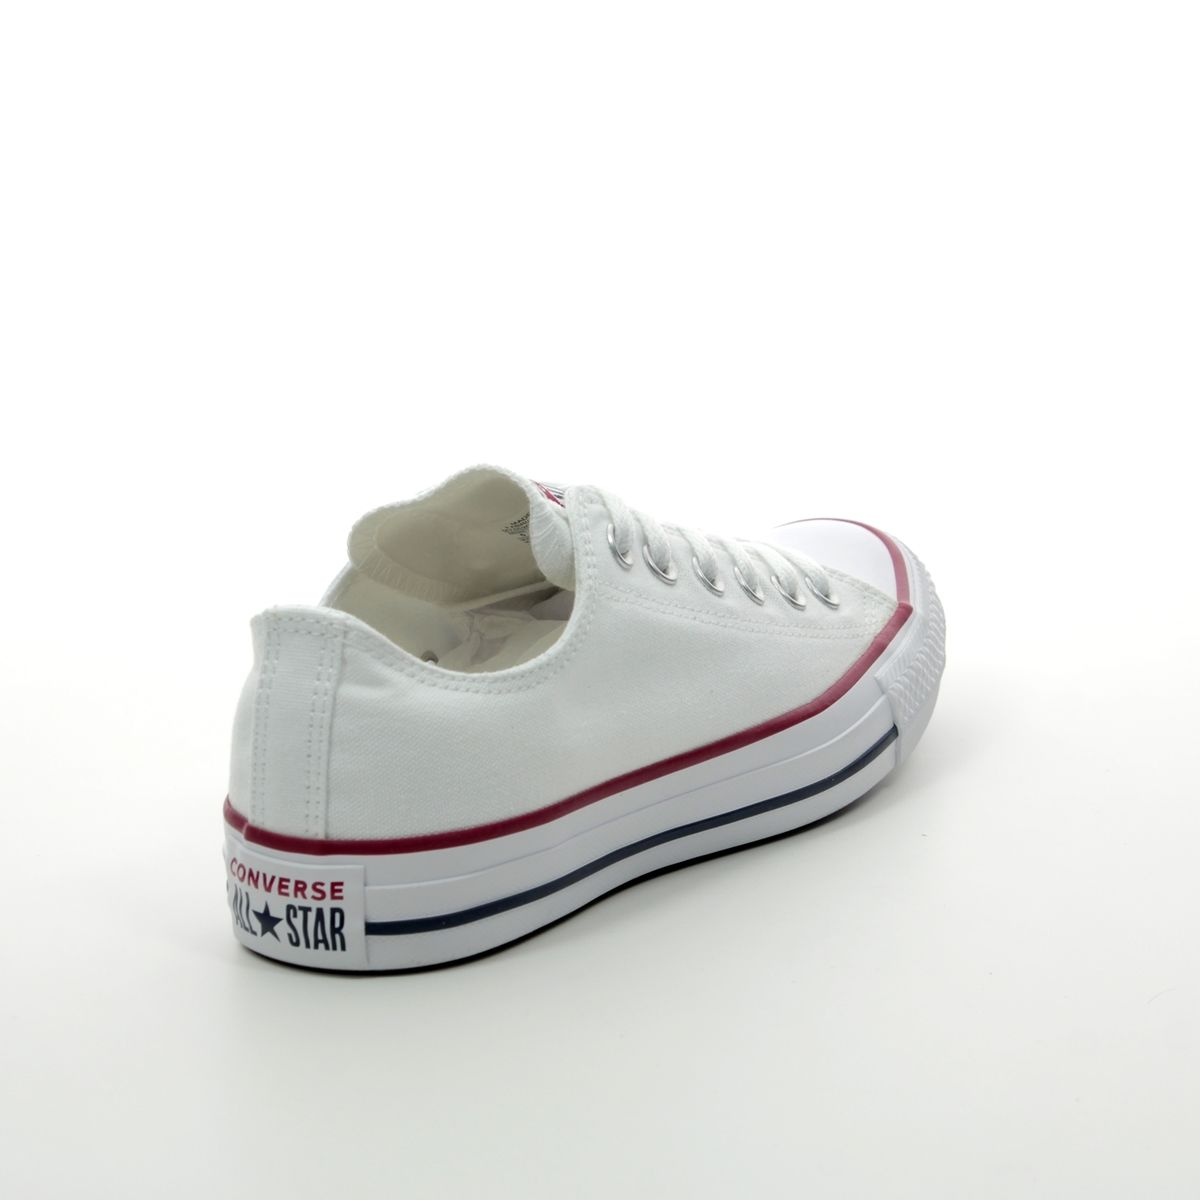 1c7edb787cc2 Converse Trainers - White - M7652C All Star Ox Classic